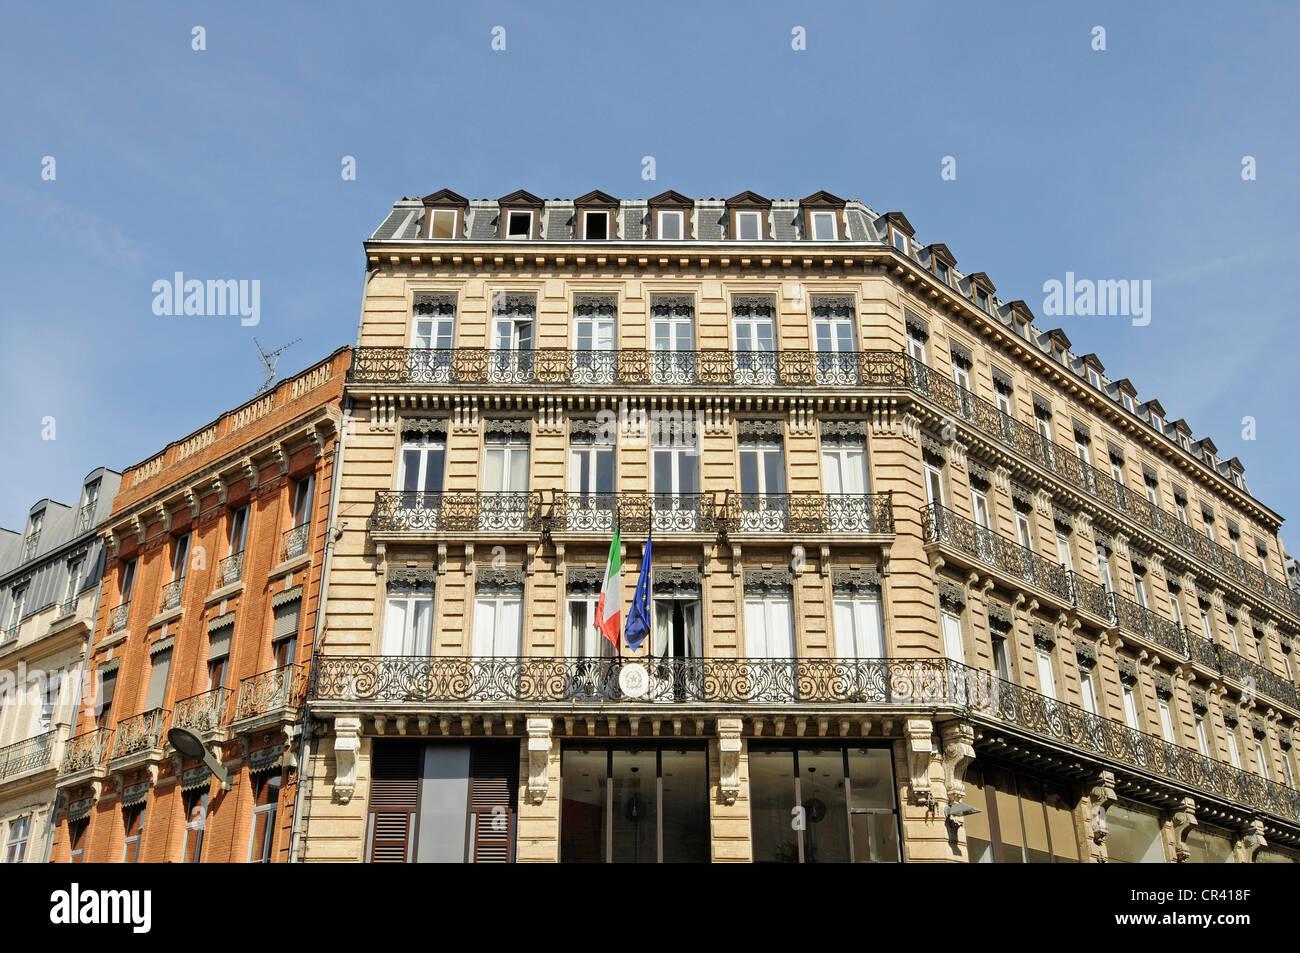 Facade, Toulouse, Departement Haute-Garonne, Midi-Pyrenees, France, Europe - Stock Image